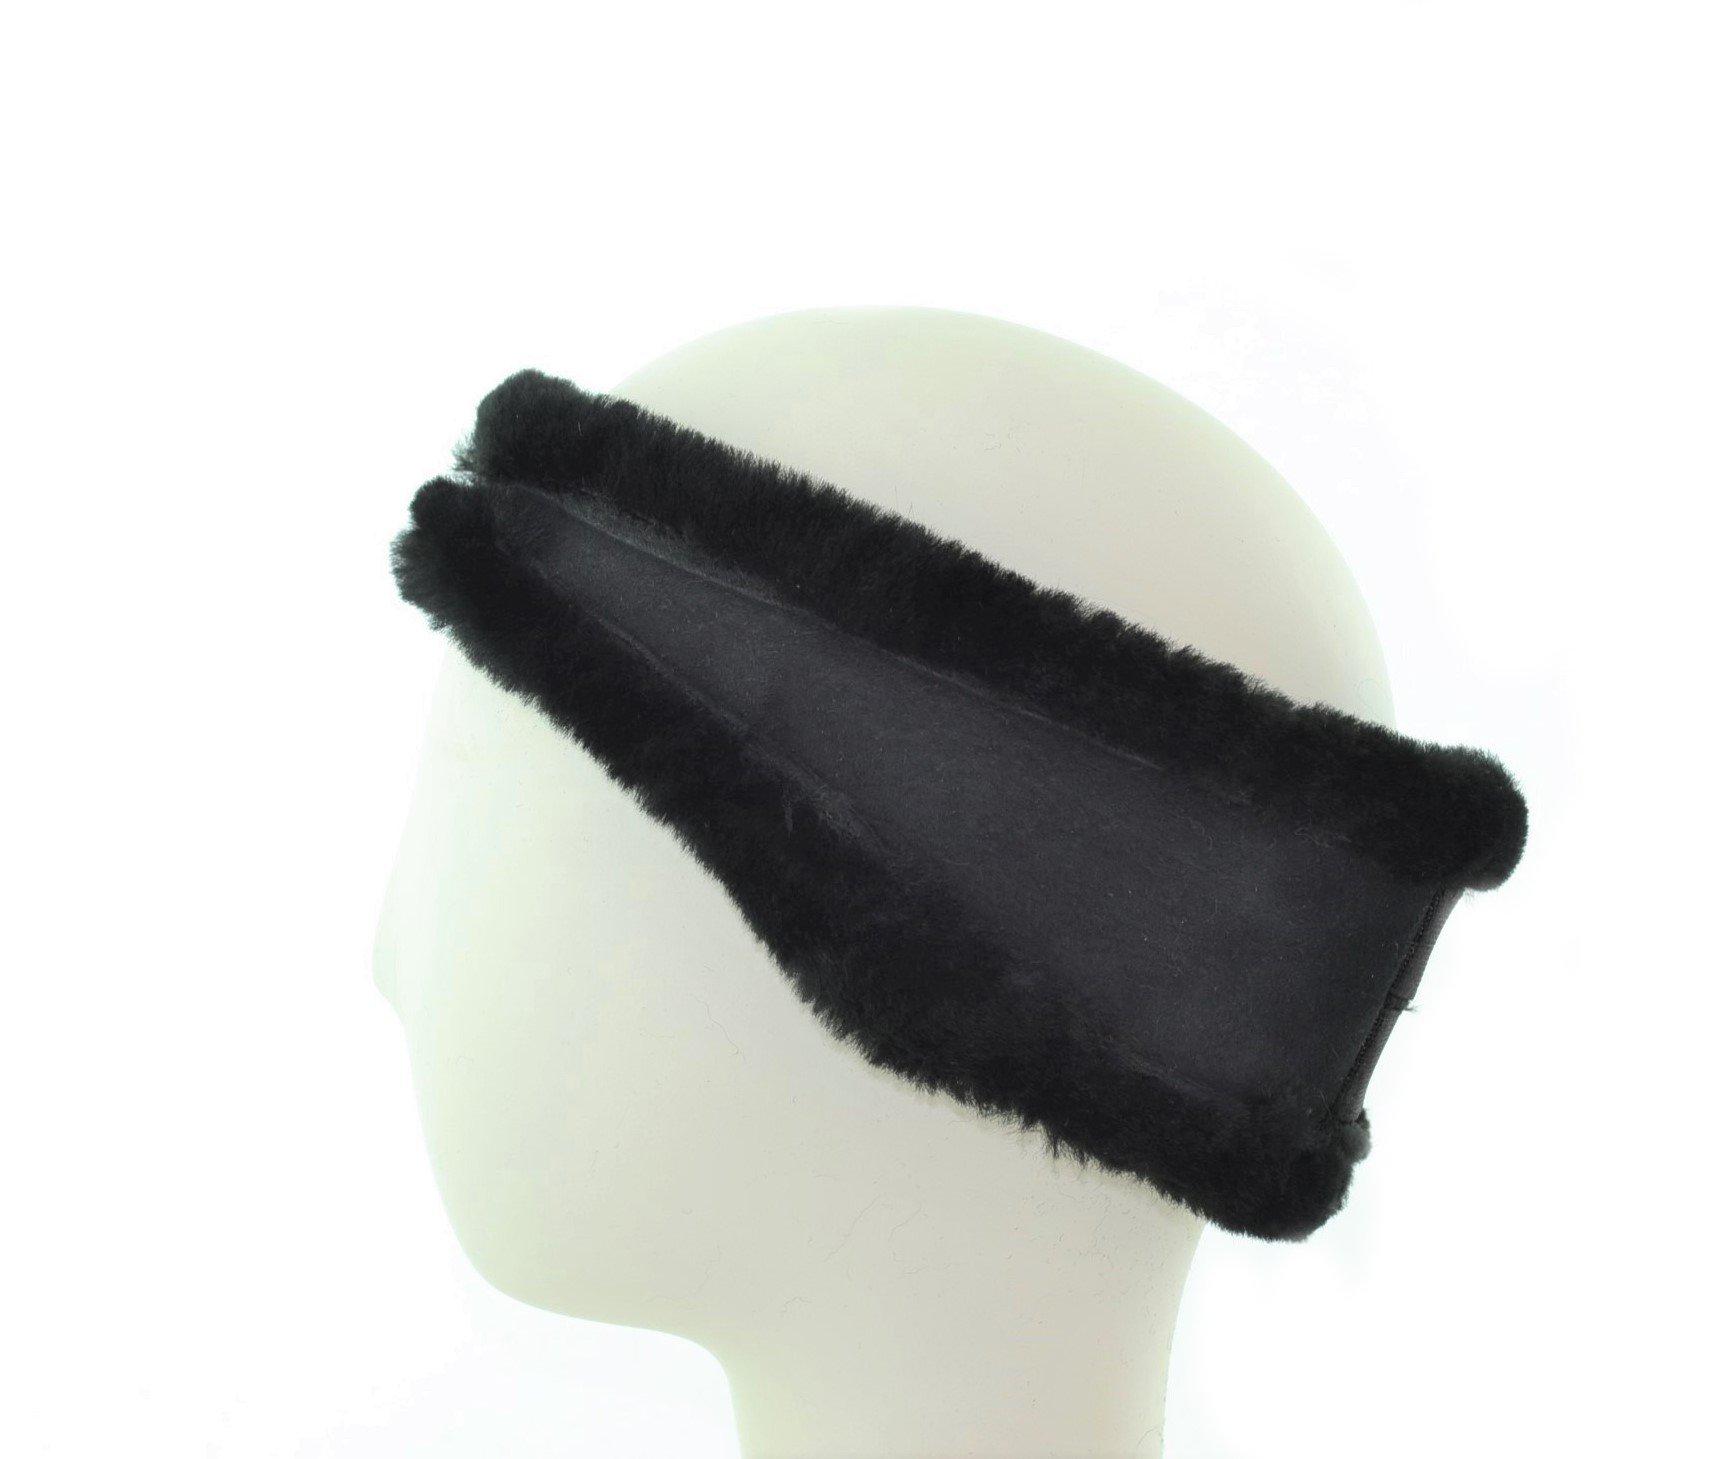 Surell Genuine Soft Black Shearling Headband - Winter Fashion Sheepskin Ear Warmers - Perfect Elegant Women's Luxury Gift